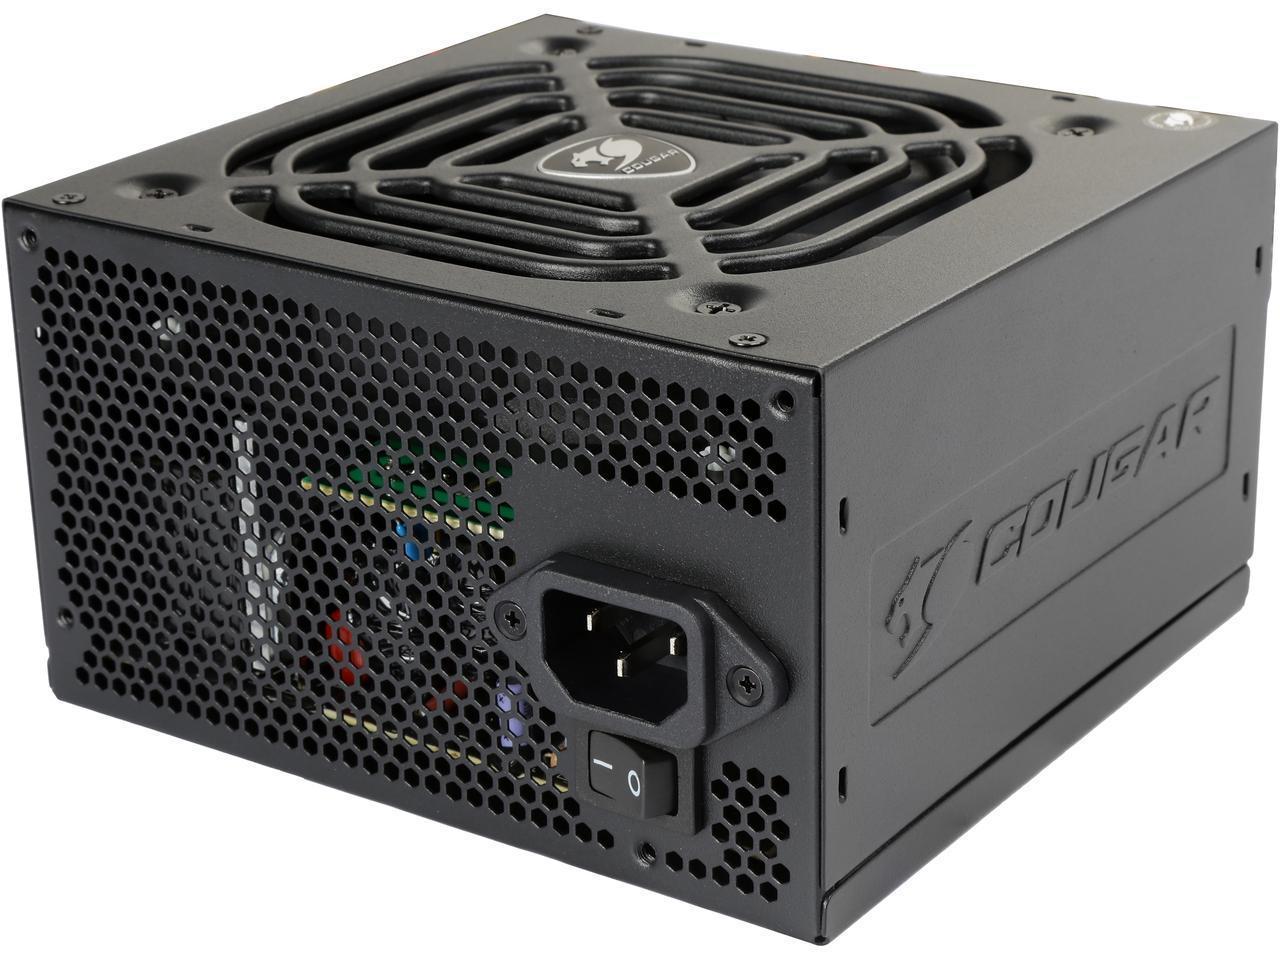 COUGAR VTE500 500W 80 PLUS BRONZE  Power Supply 25AR $24.99